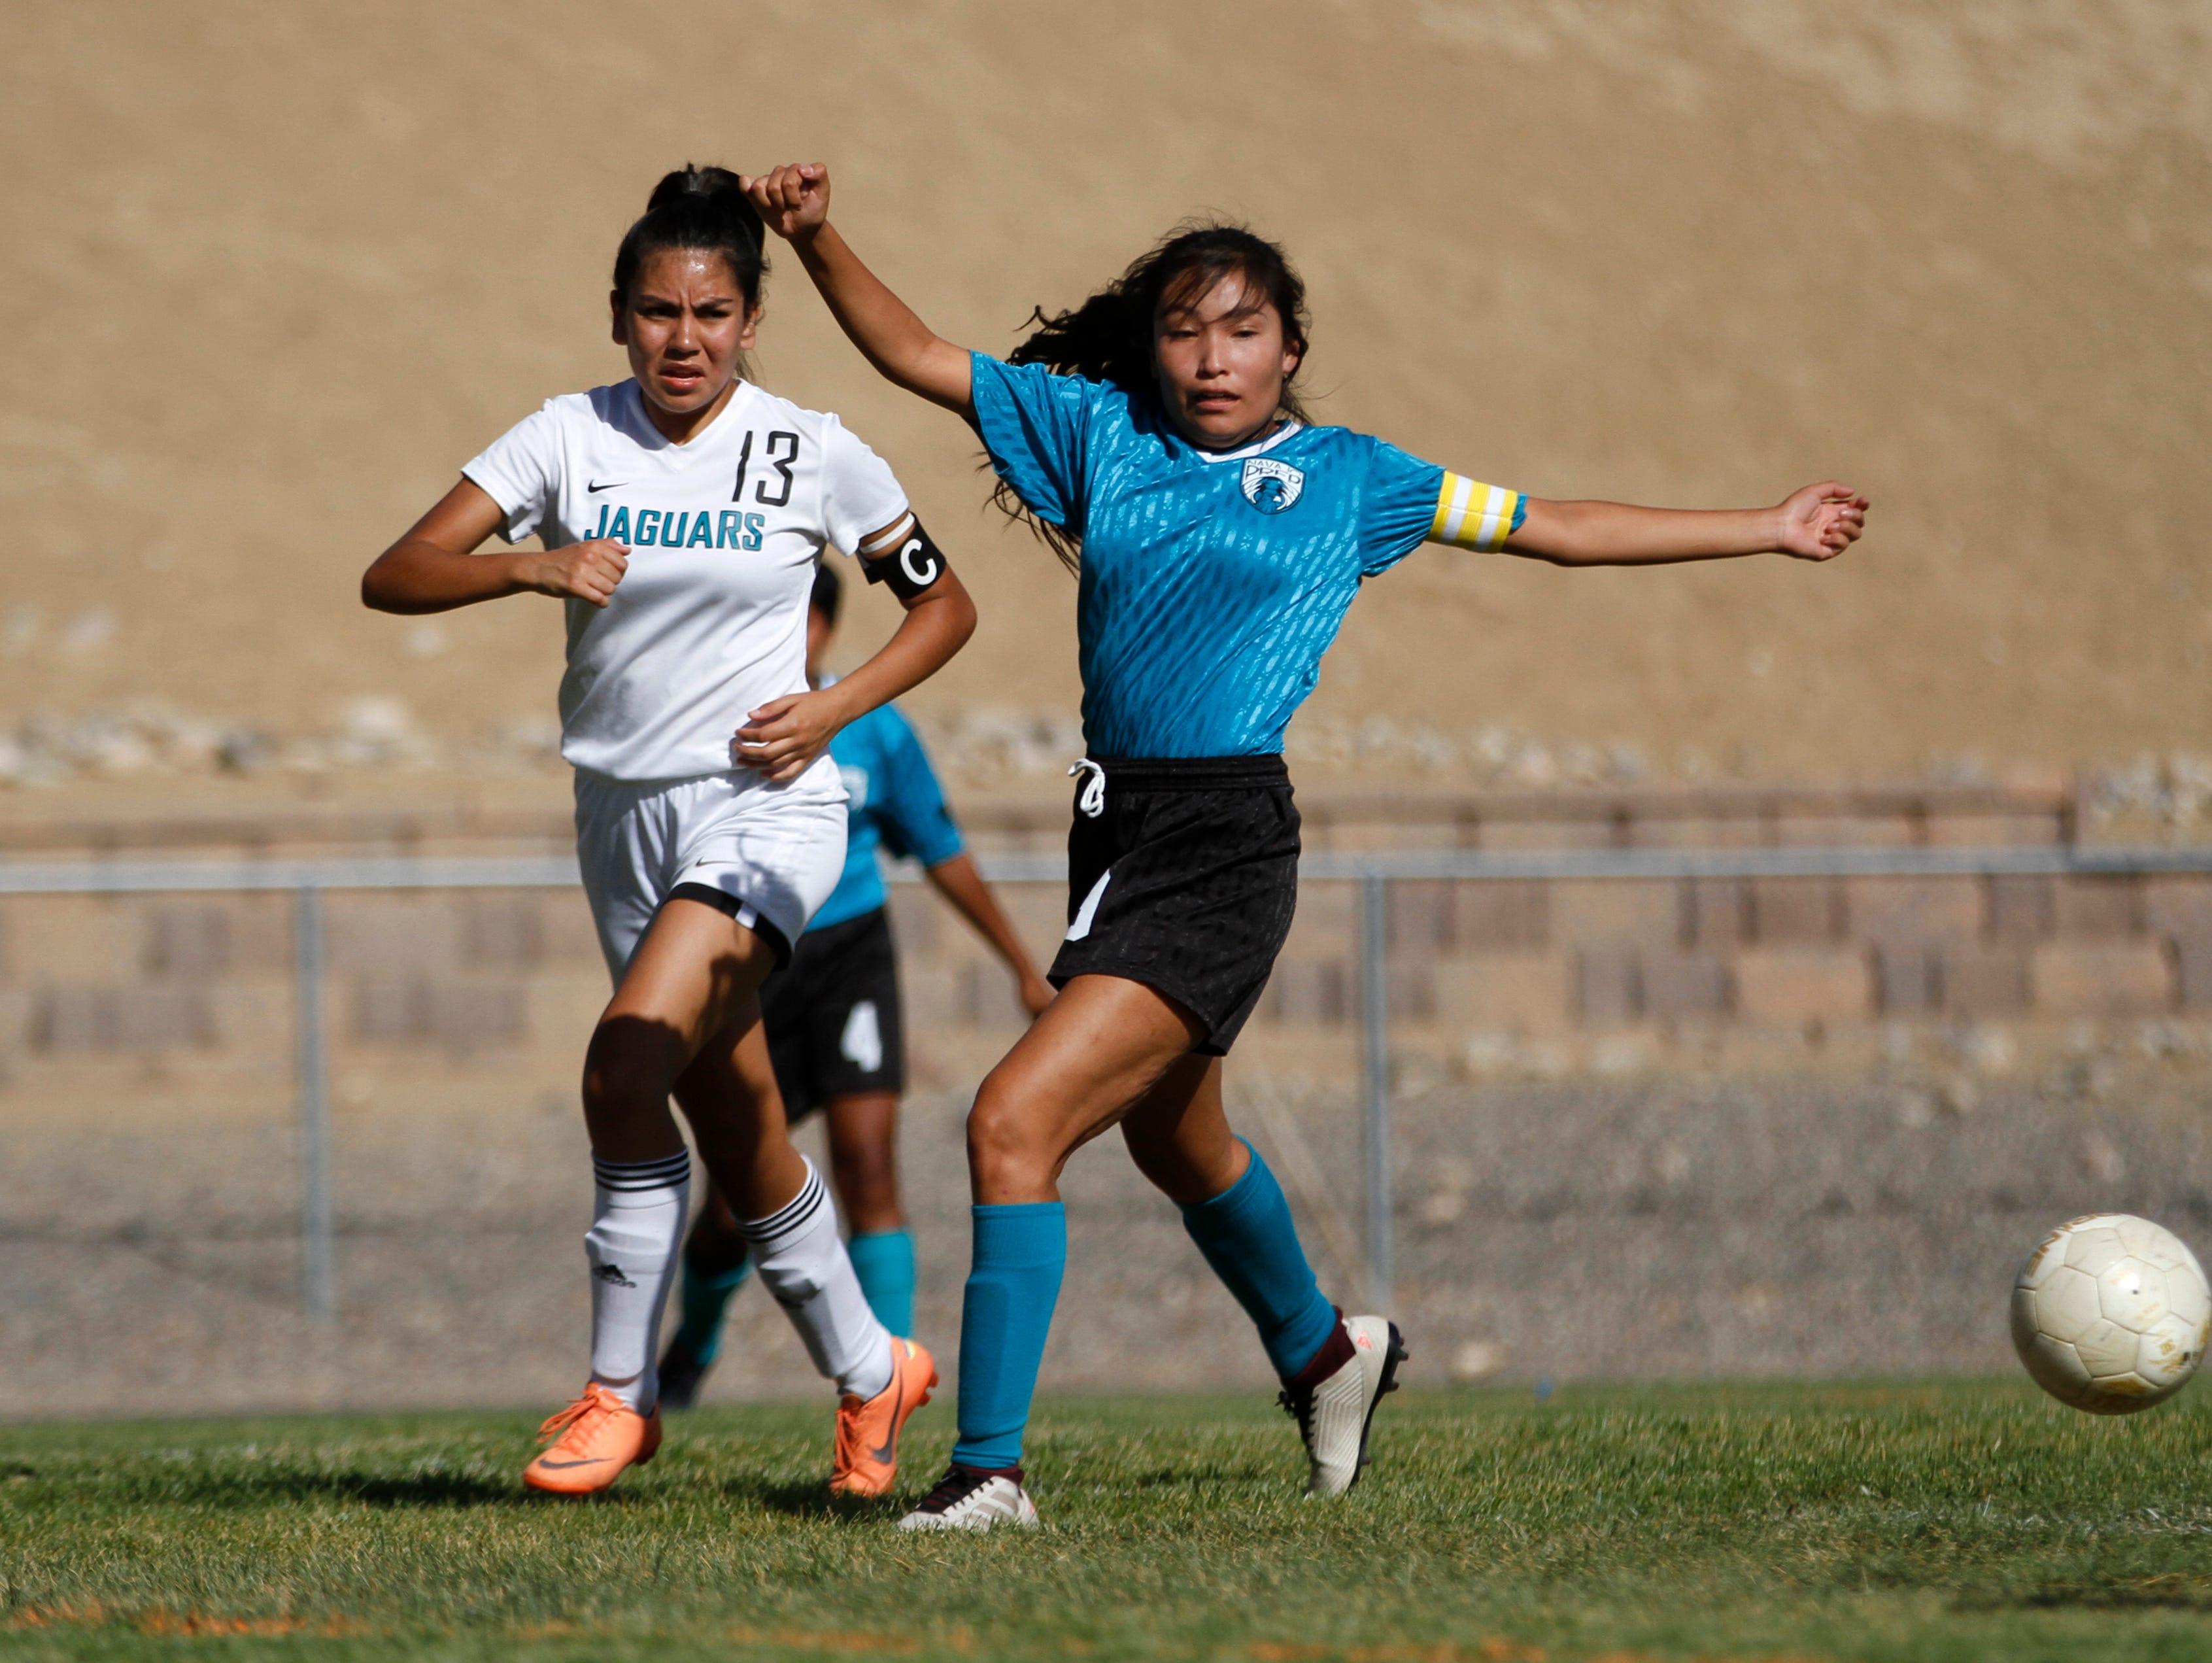 Capital's Melissa Santos  and Navajo Prep's Geena Tsosie  chase the ball, Tuesday, Sept. 11, 2018 at Eagle Stadium in Farmington.